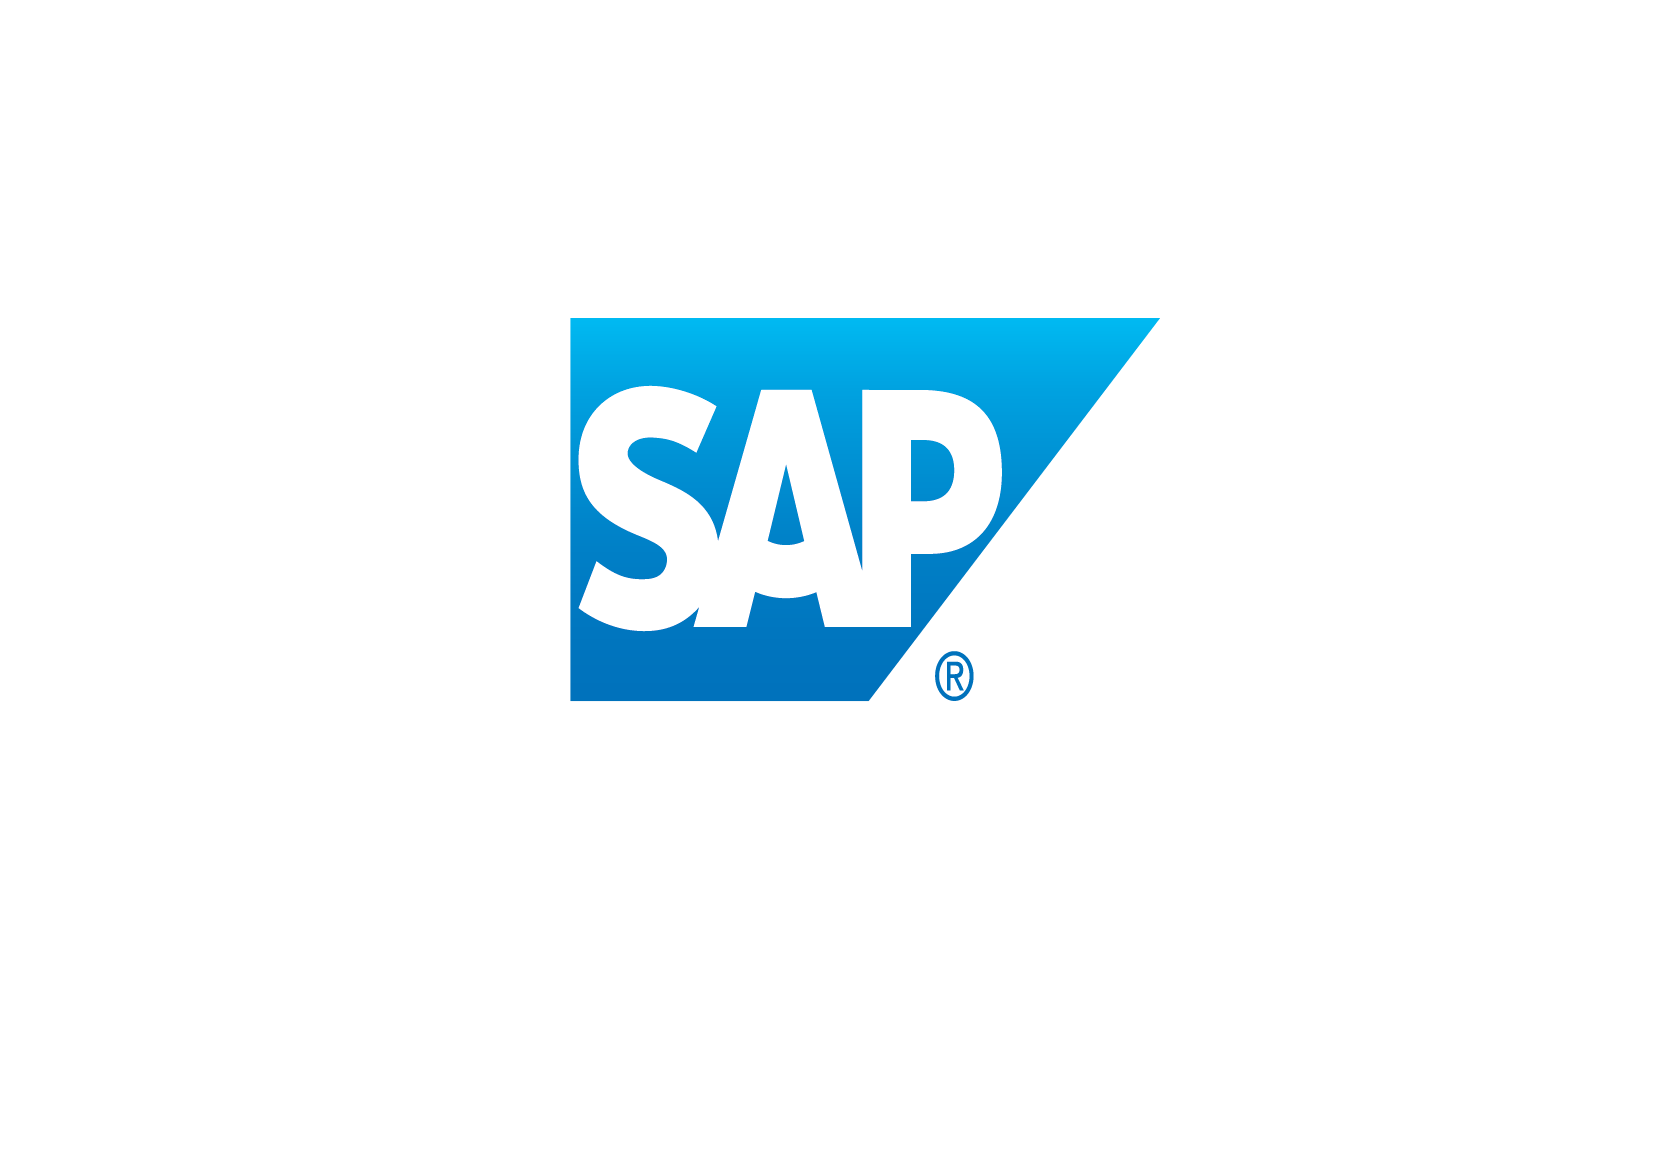 SAP China